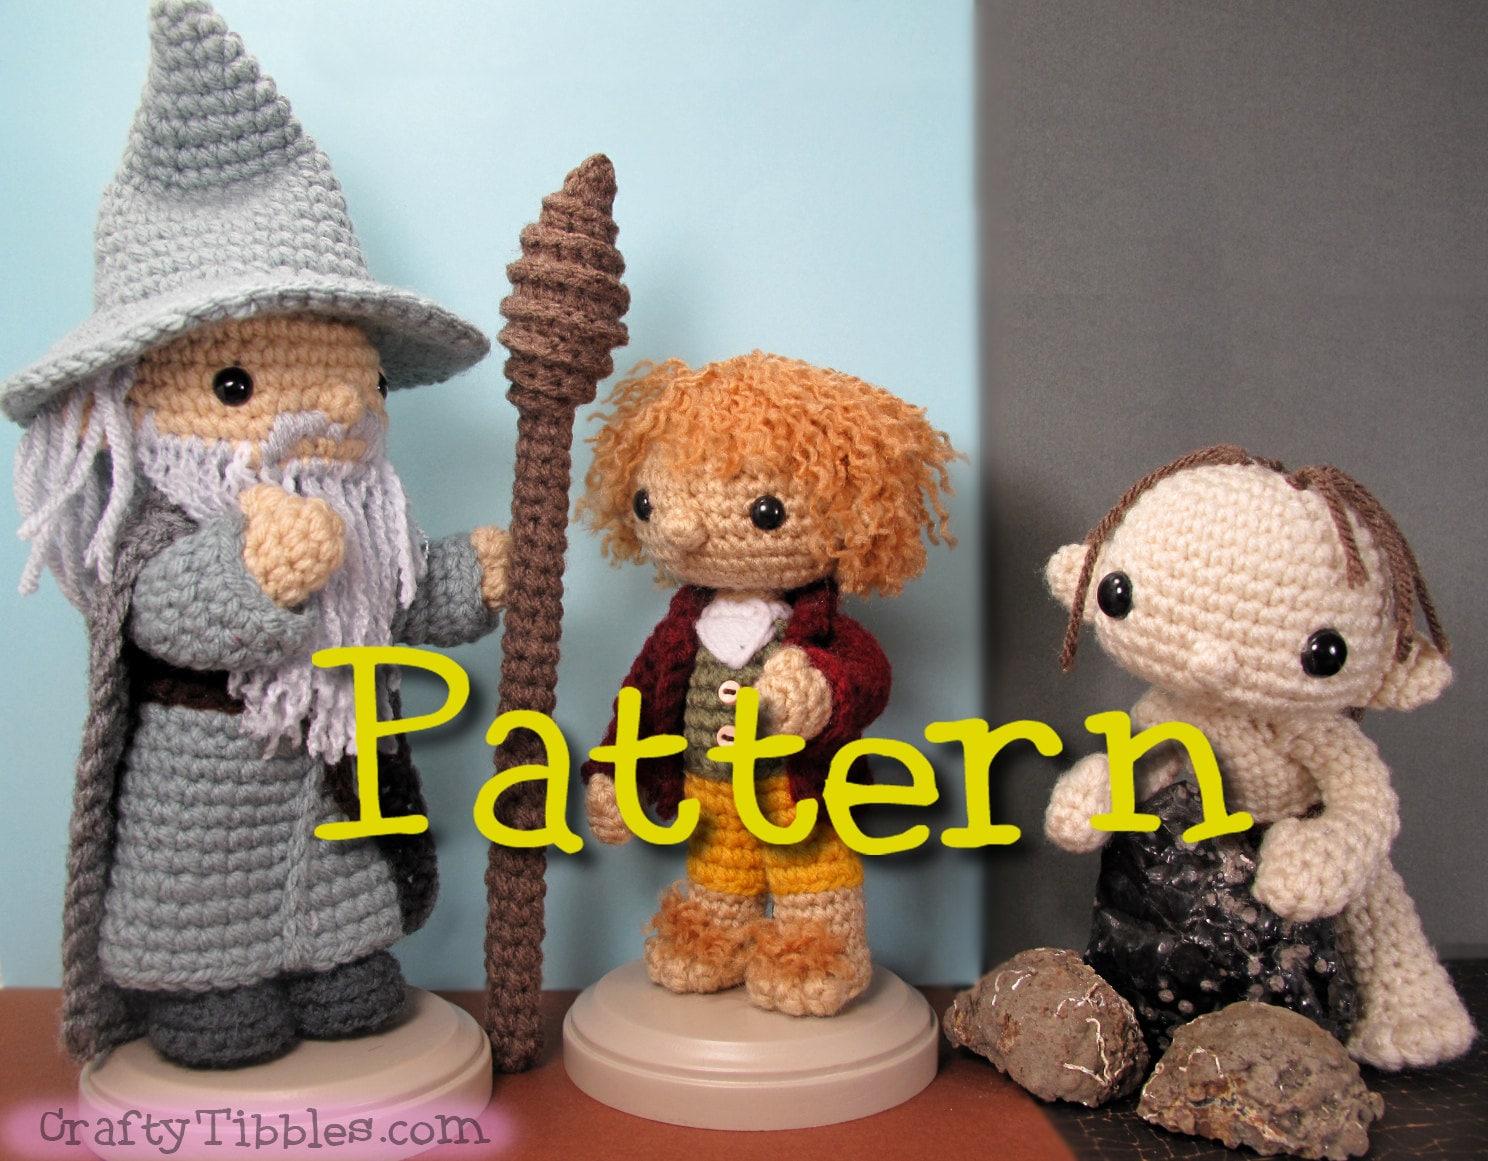 Crochet Amigurumi Patterns : Bilbo and gollum crochet amigurumi pattern